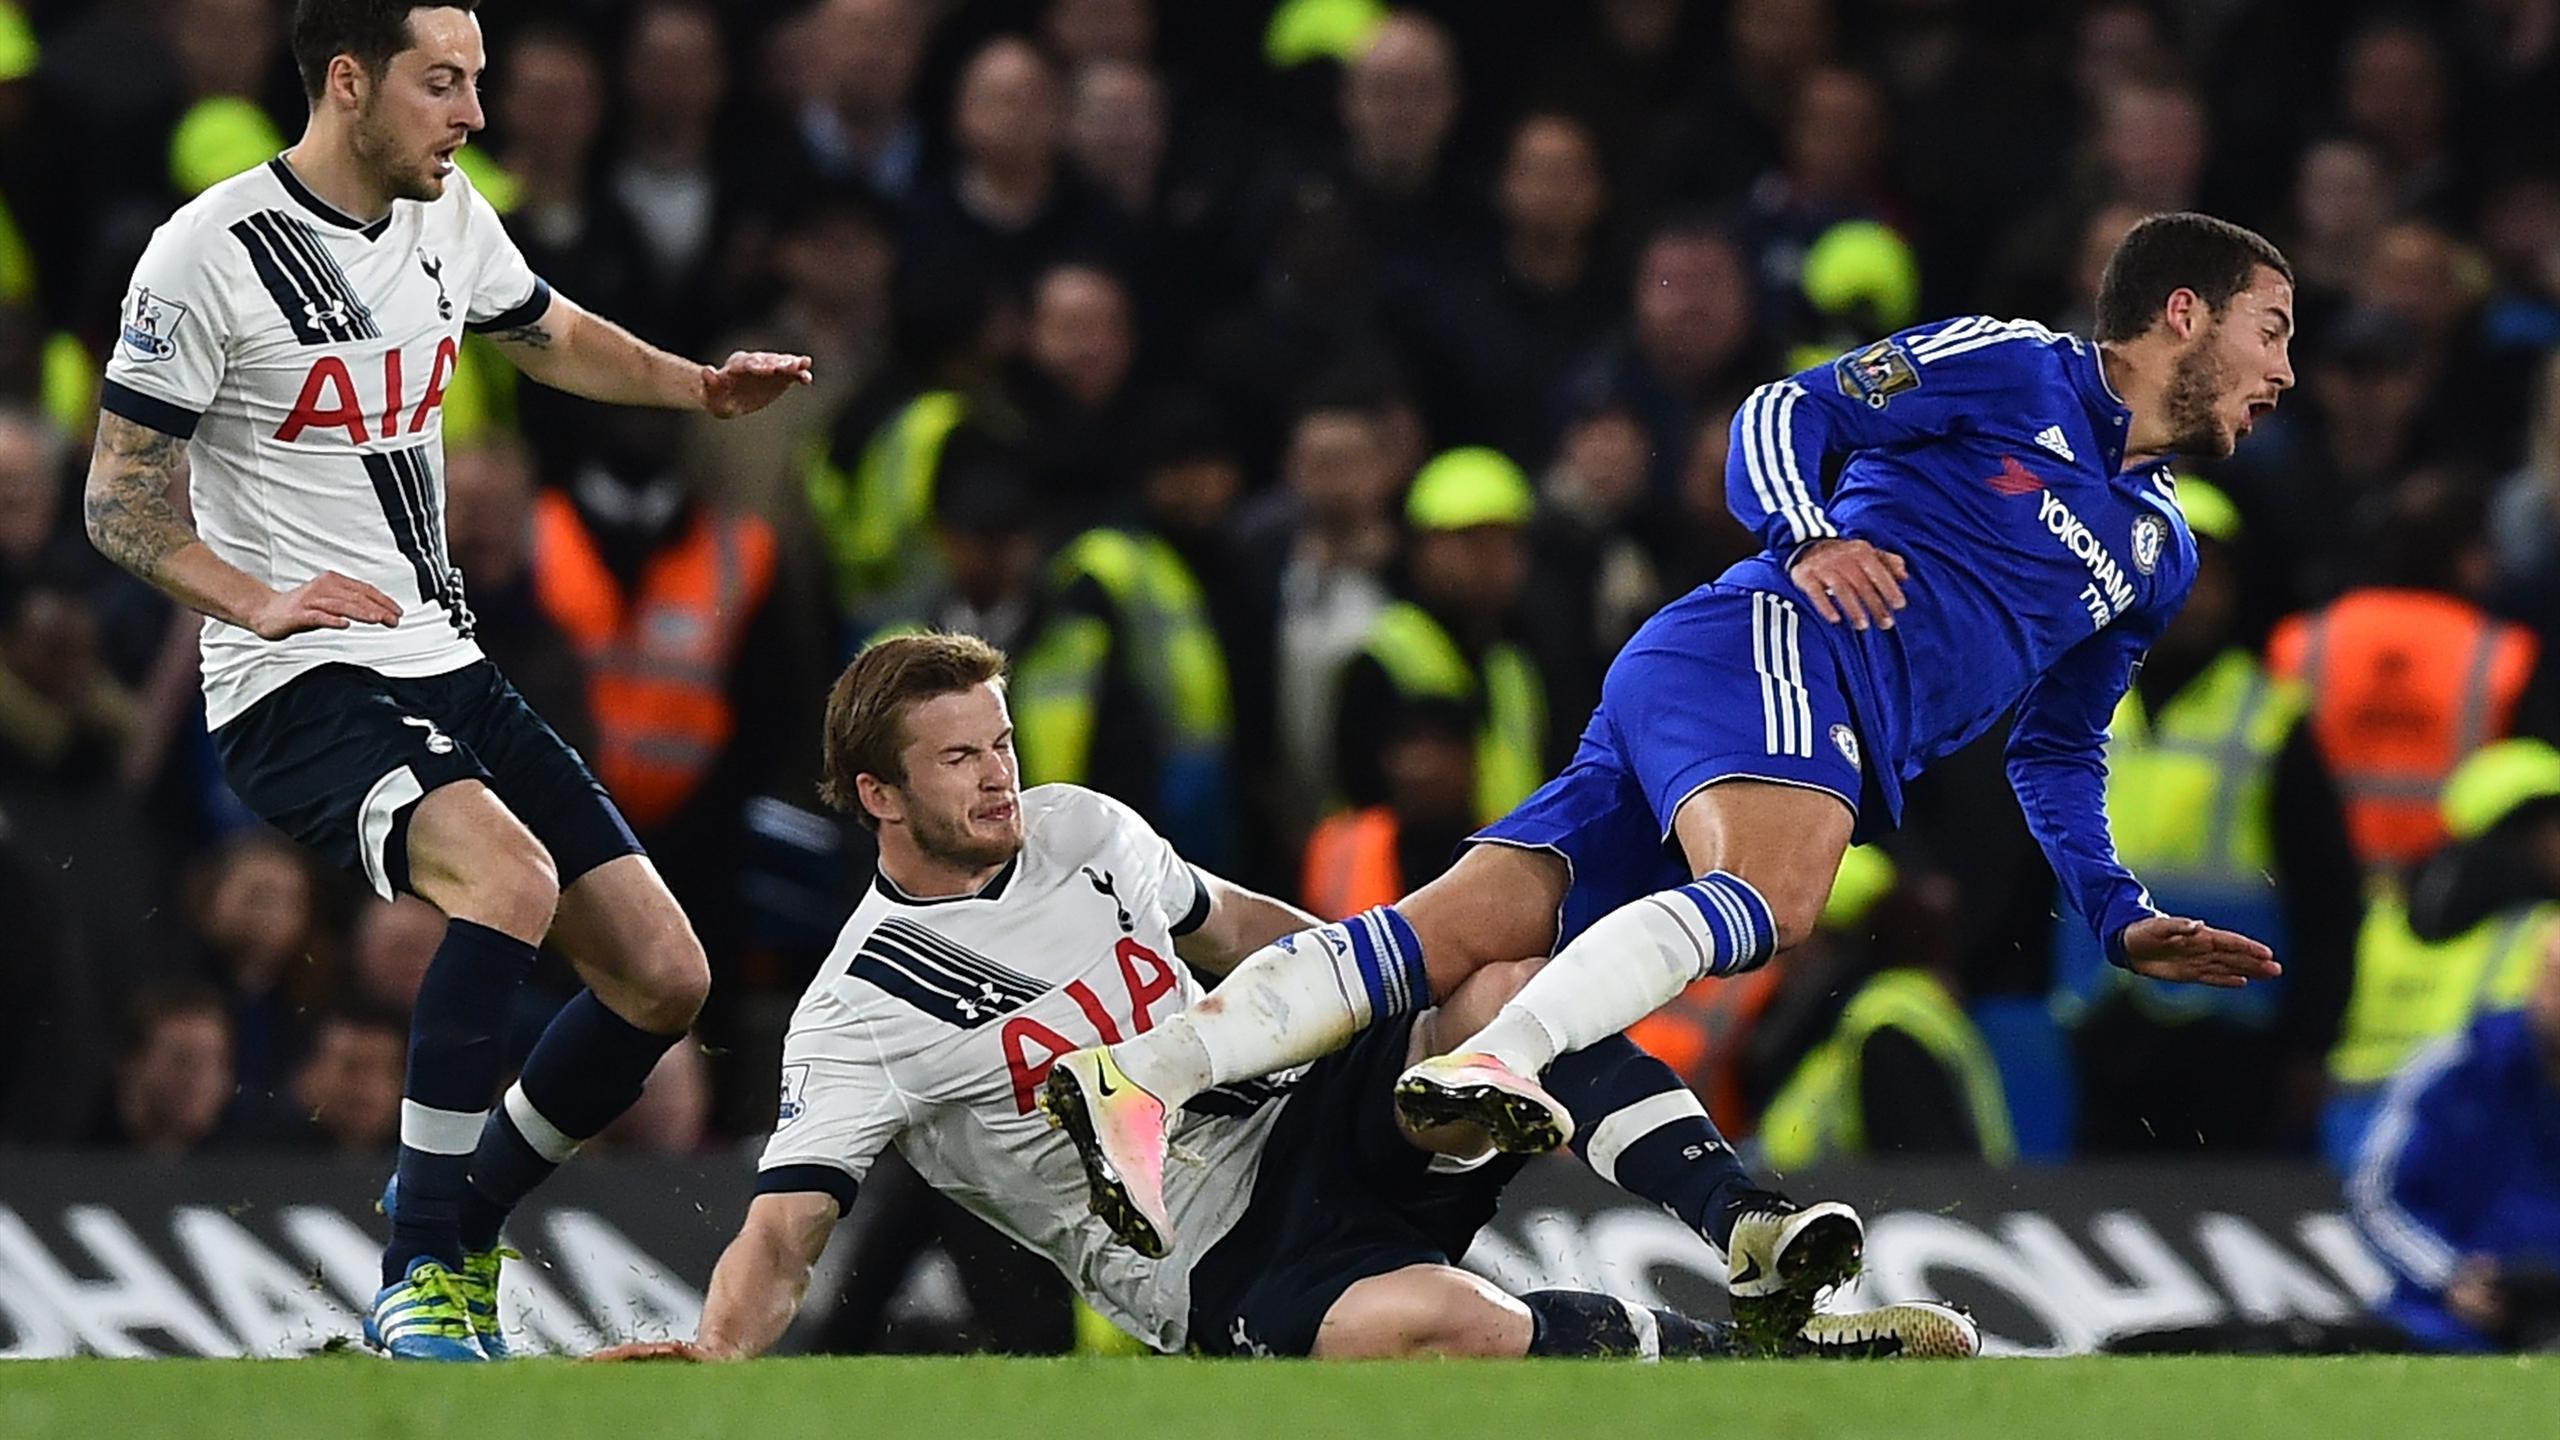 Tottenham Hotspur's English defender Eric Dier (C) fouls Chelsea's Belgian midfielder Eden Hazard (R)